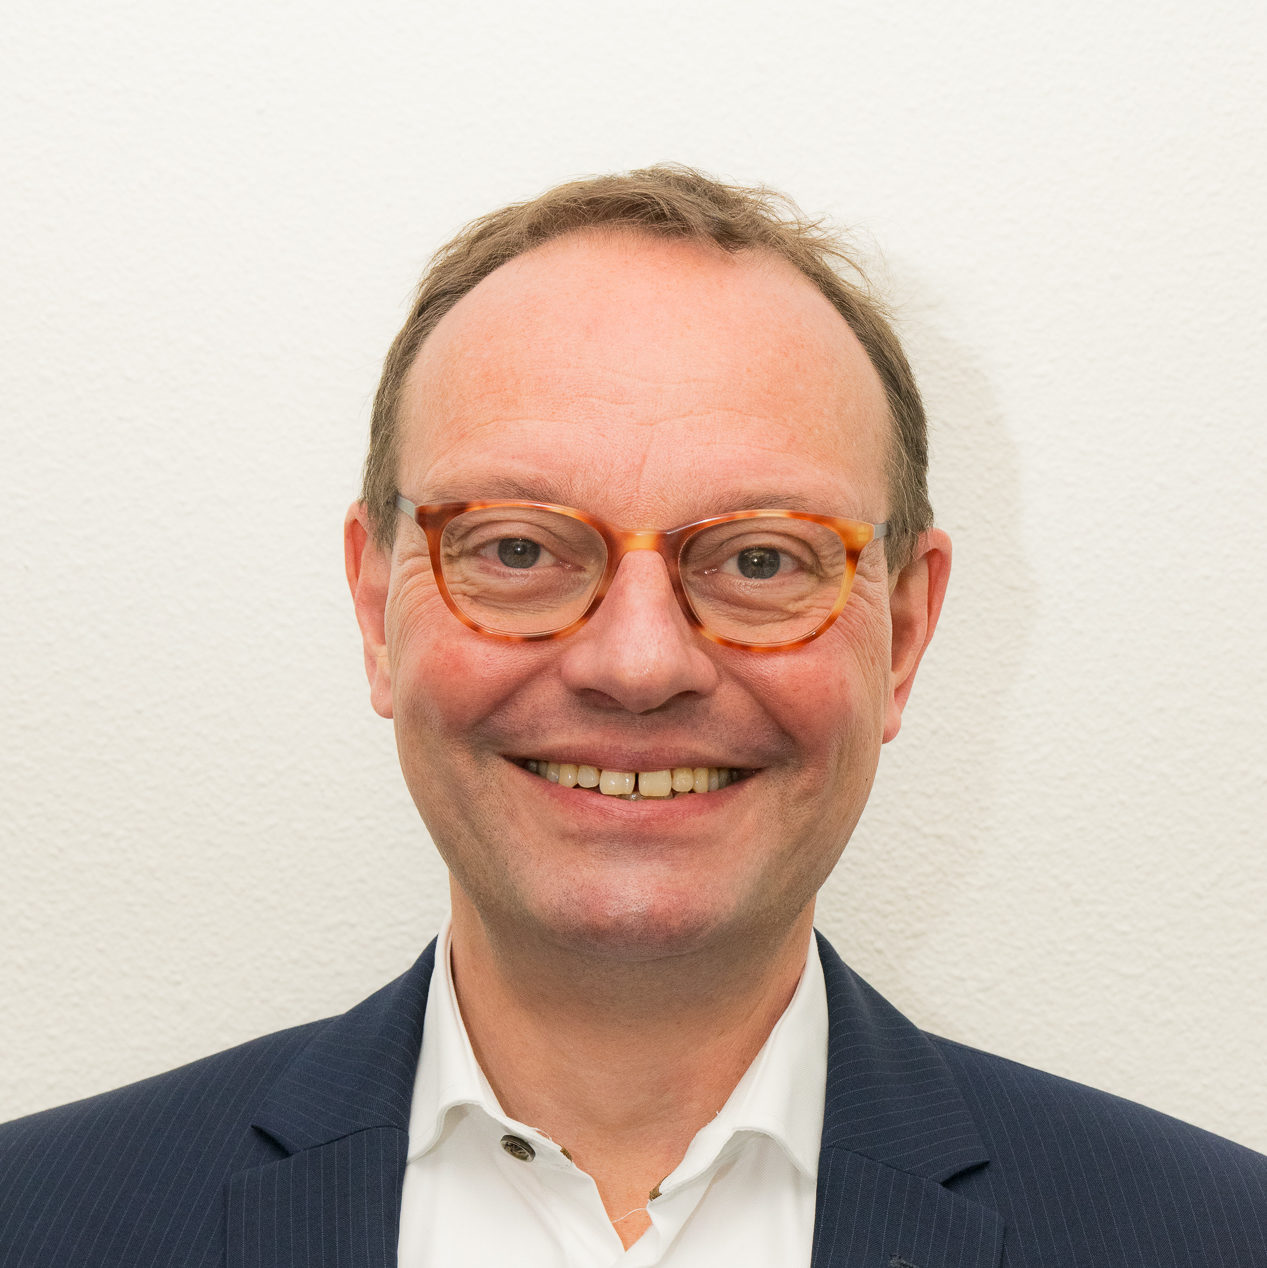 Hans van Dijk